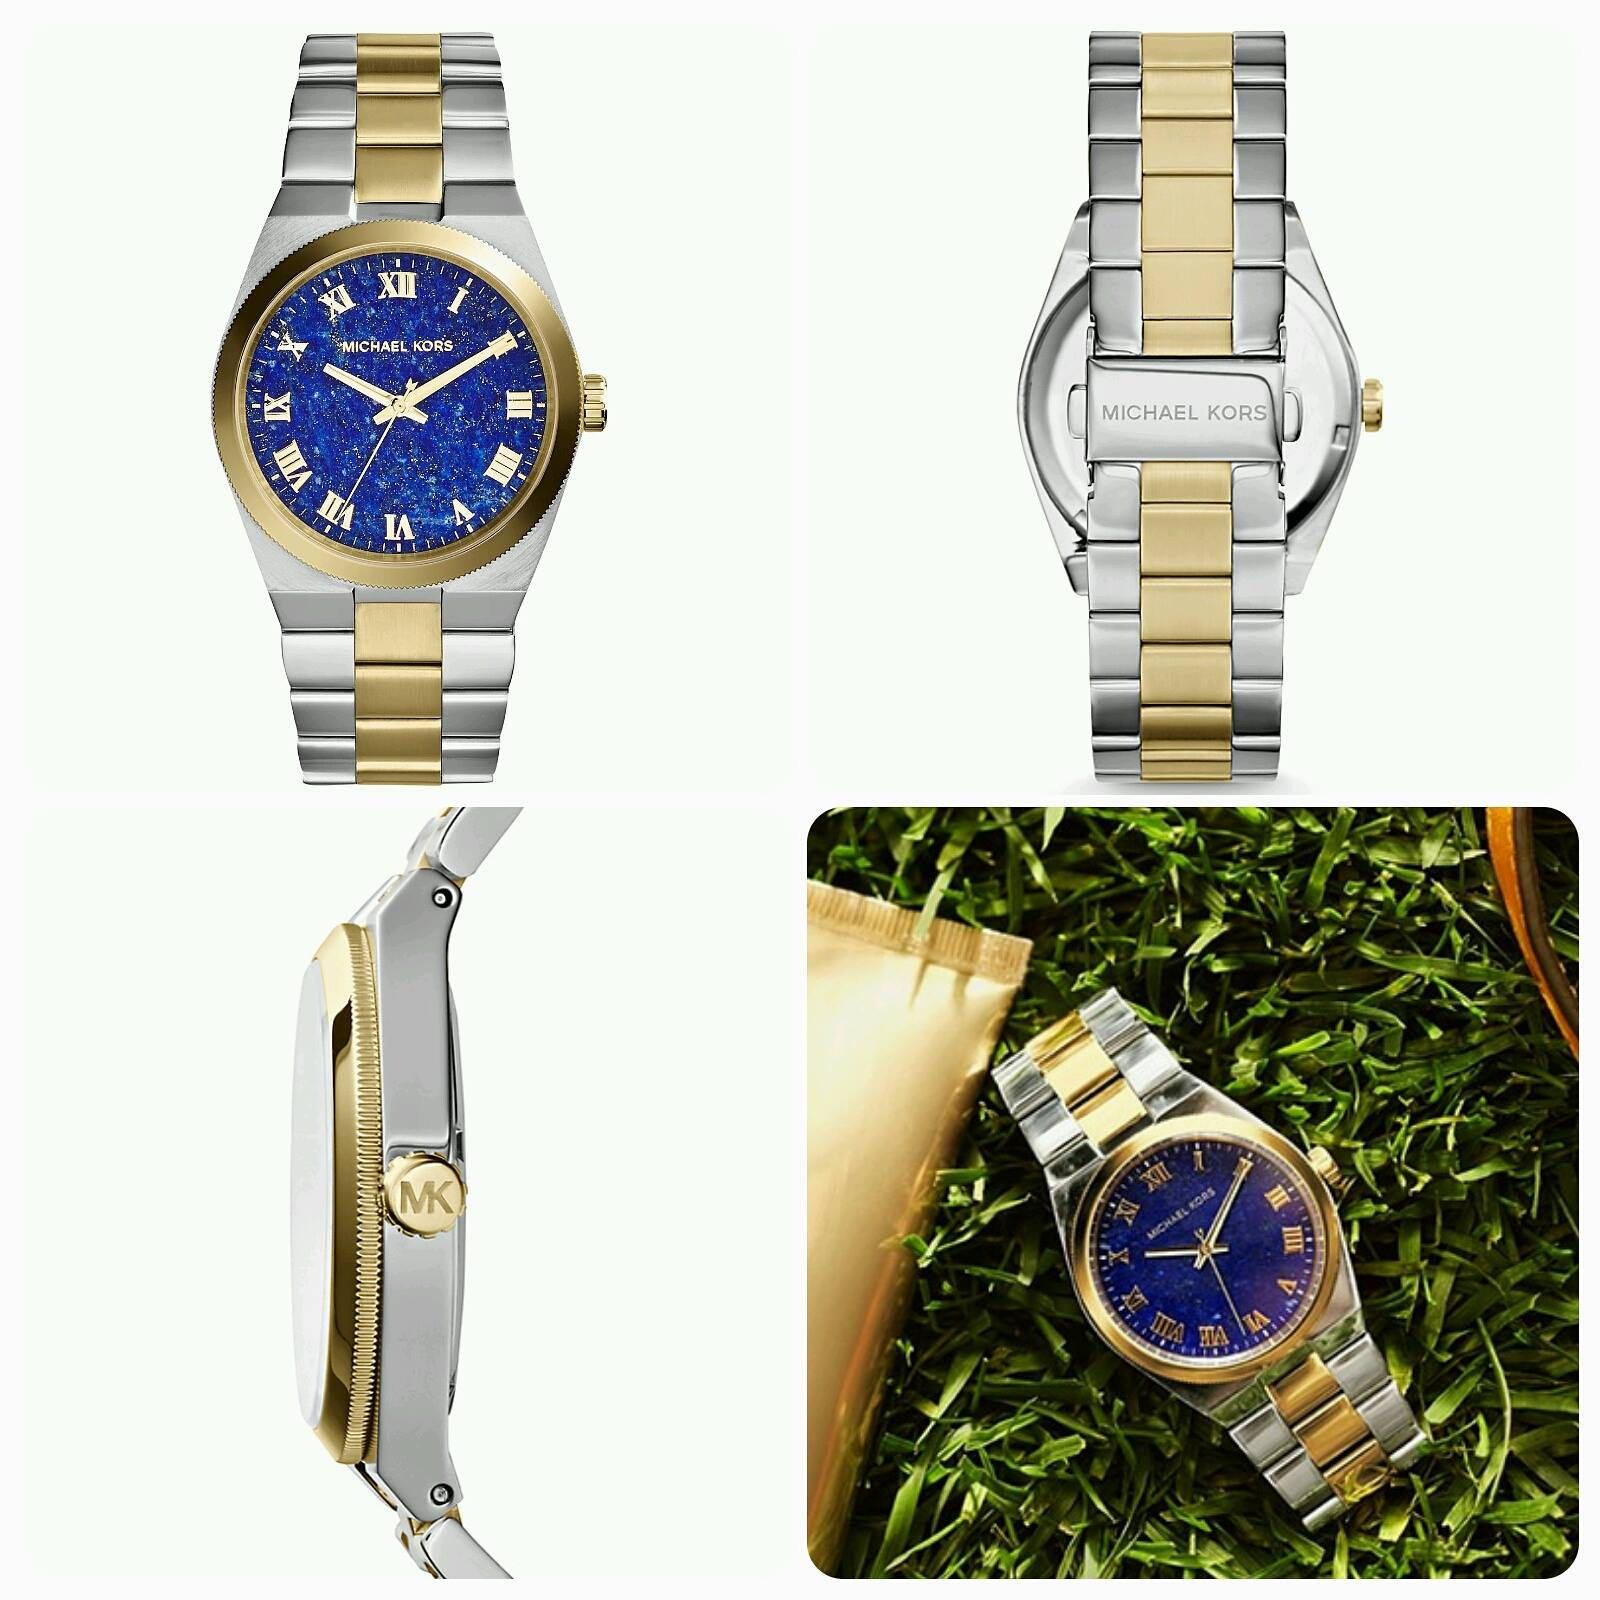 9ec753402bef PrettyTreasure2u  MK5893 Channing Two -Tone Blue Dial Watch